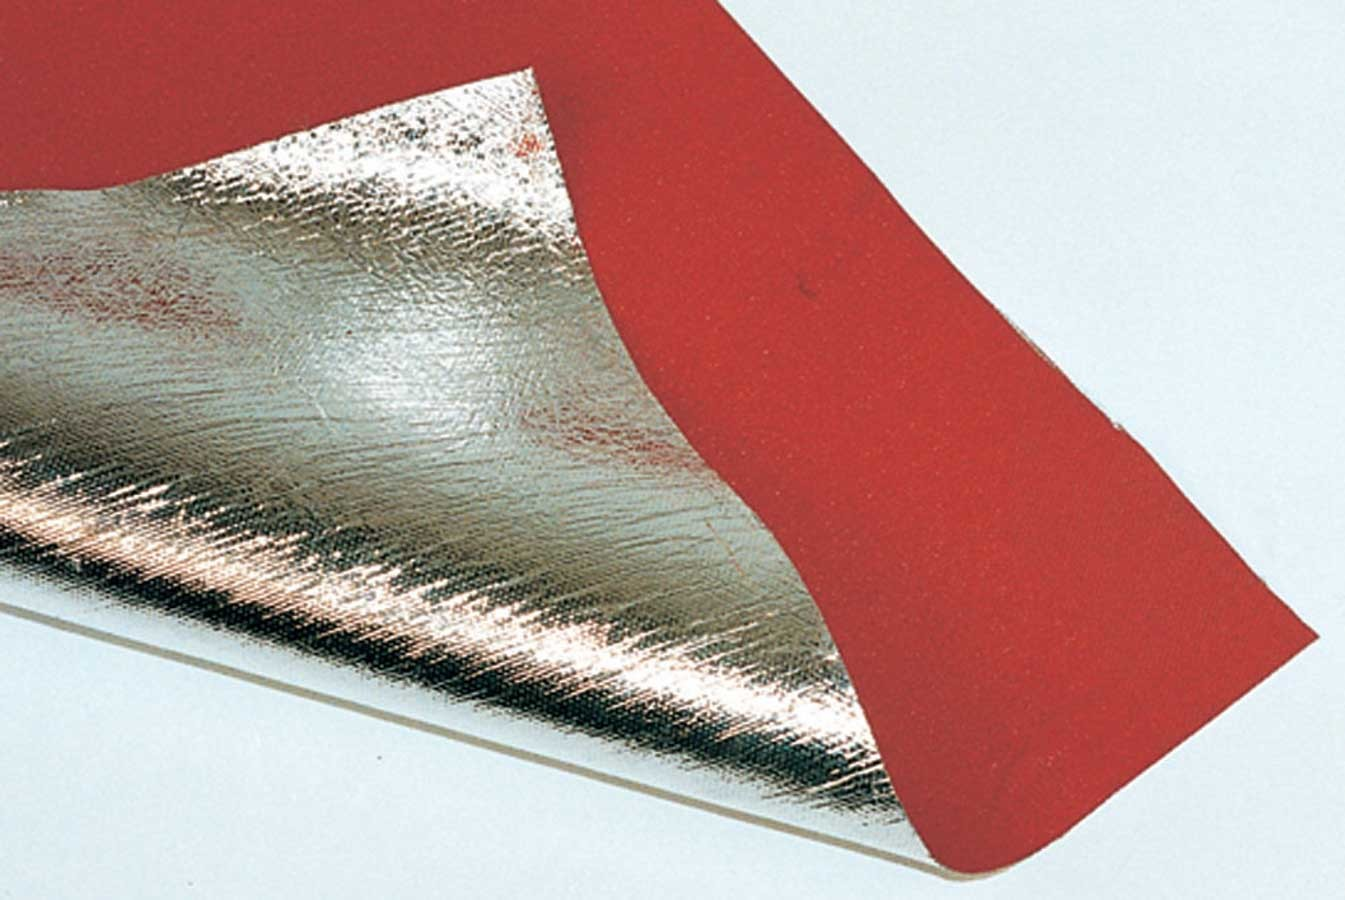 Longacre Aluminized/Silicon Cloth